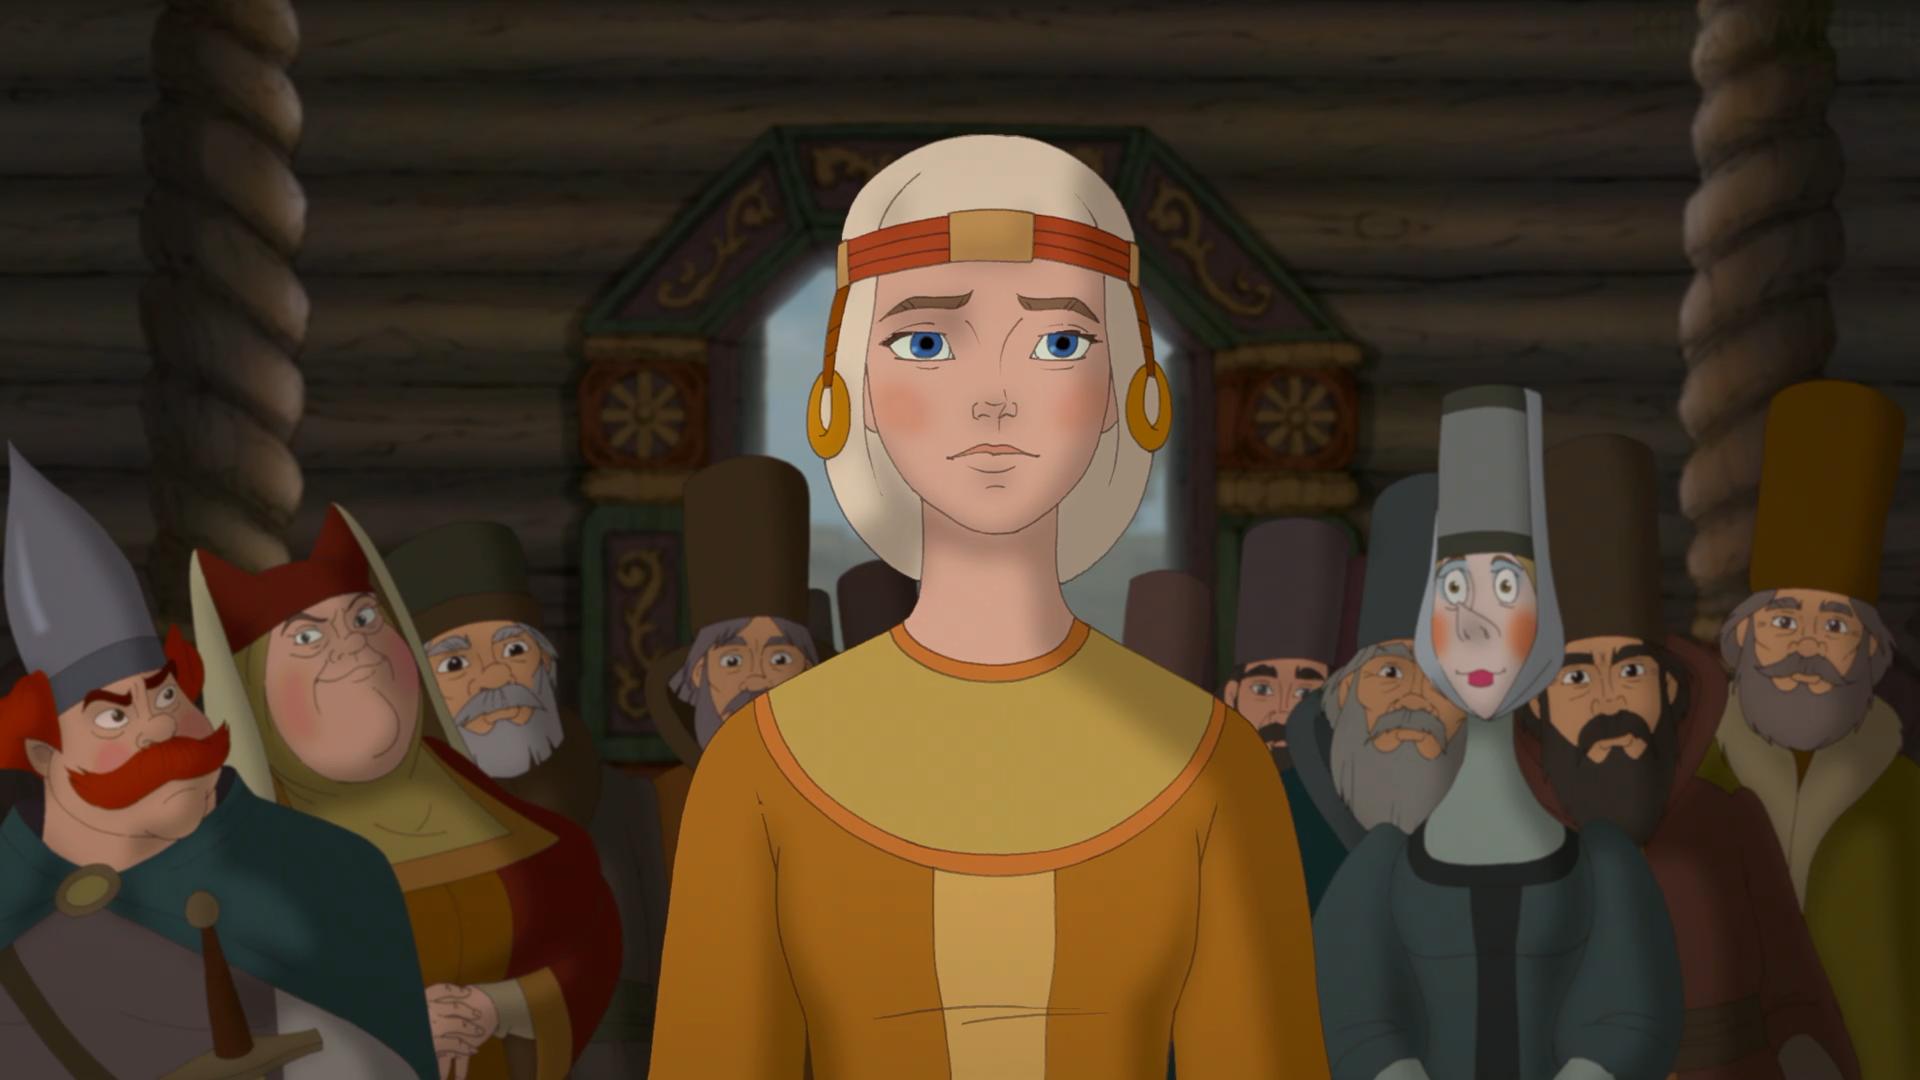 Петр и феврония картинки из мультфильма